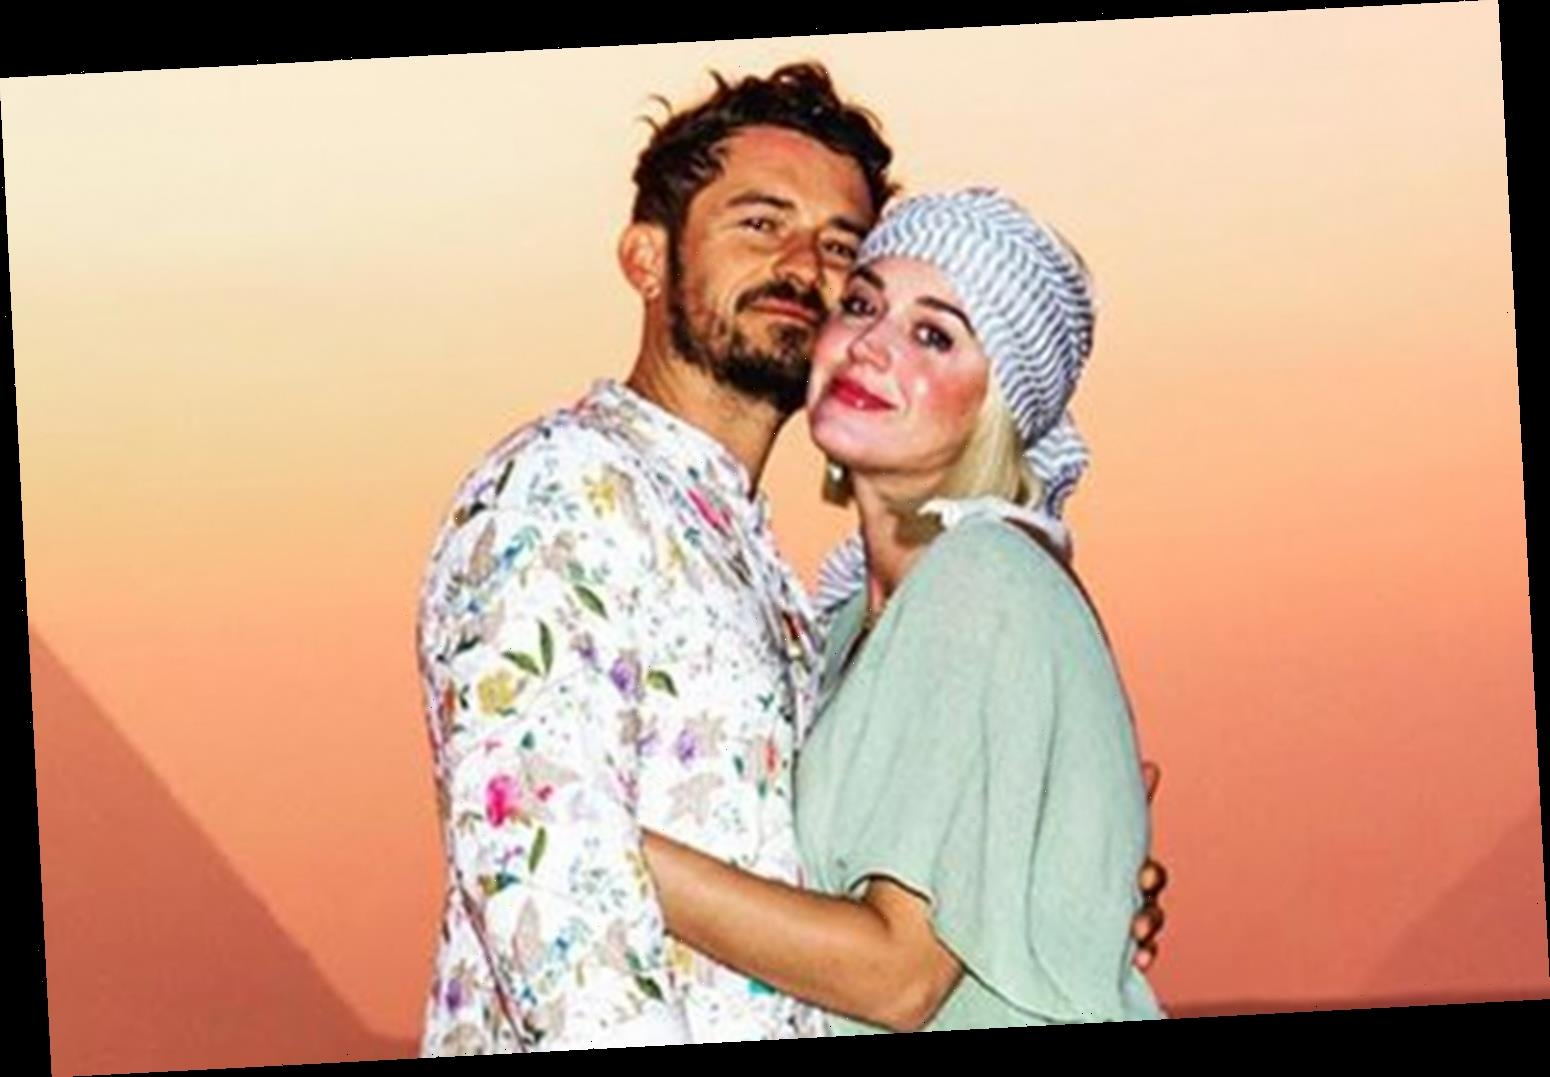 Katy Perry pens love song for fiancé Orlando Bloom ahead of their wedding – The Sun